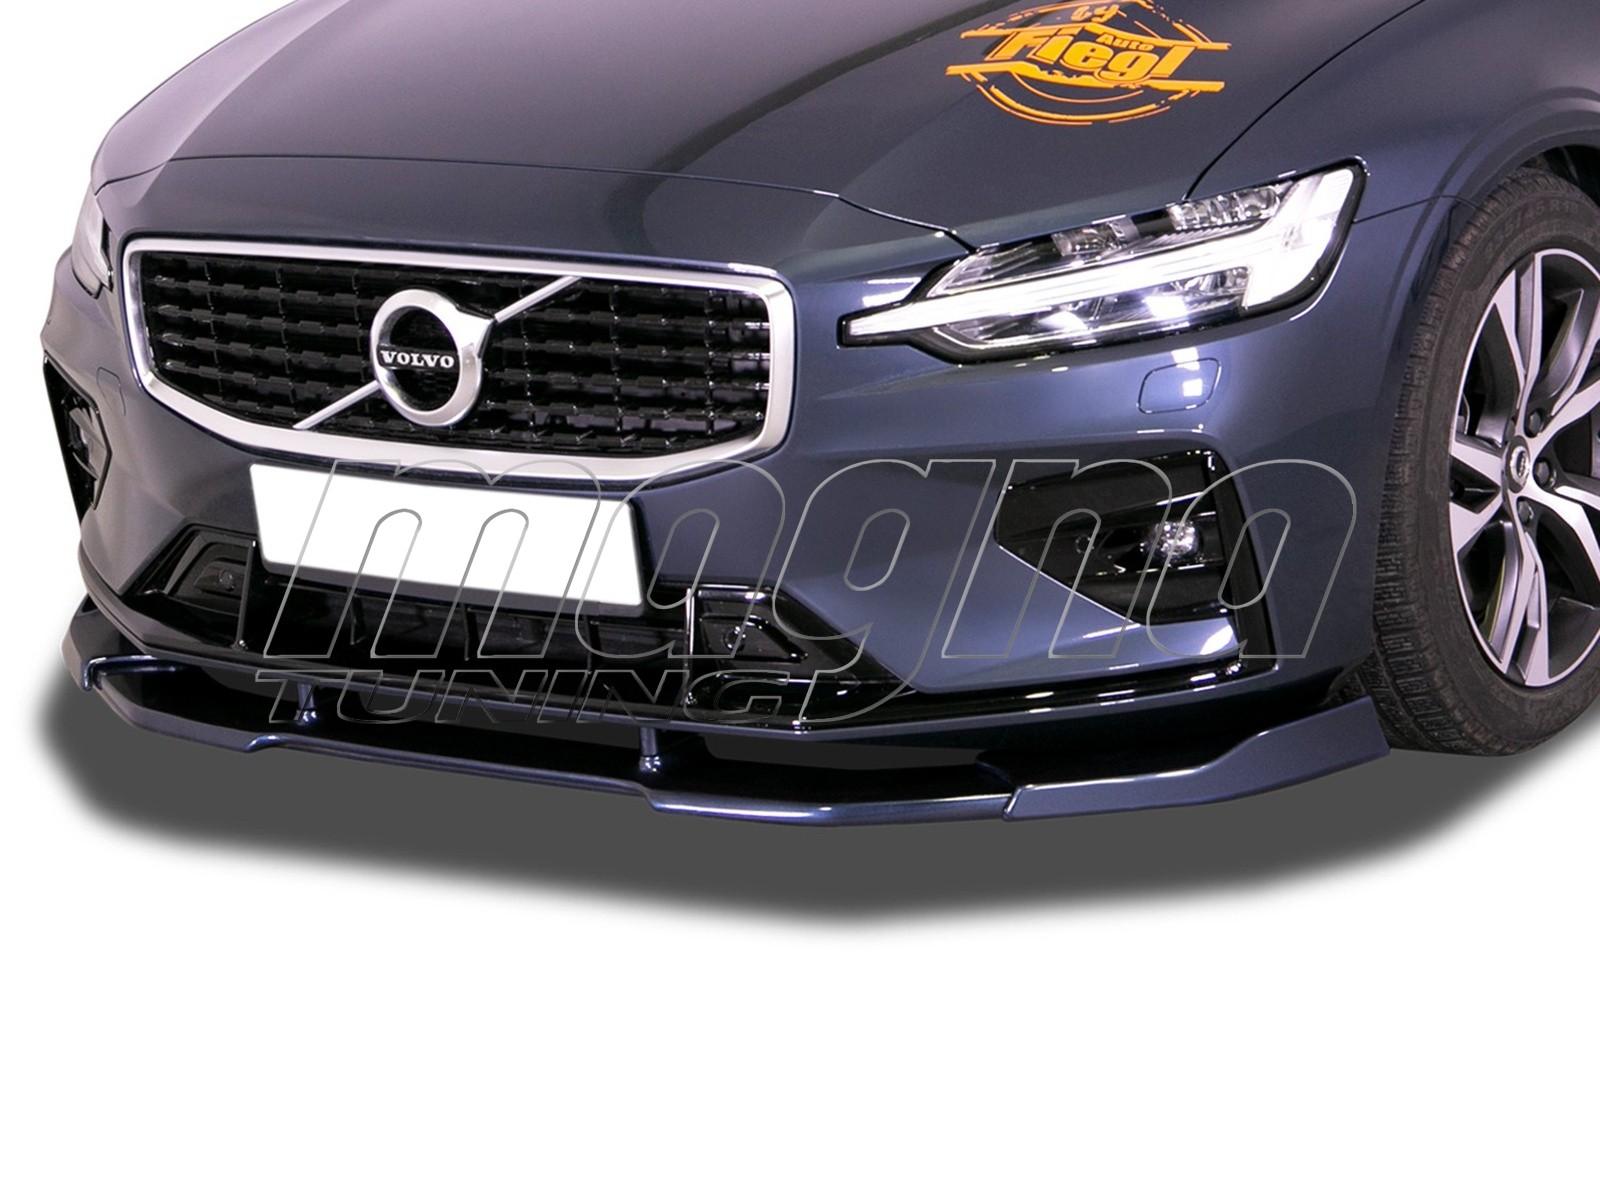 Volvo V60 MK2 RX Front Bumper Extension